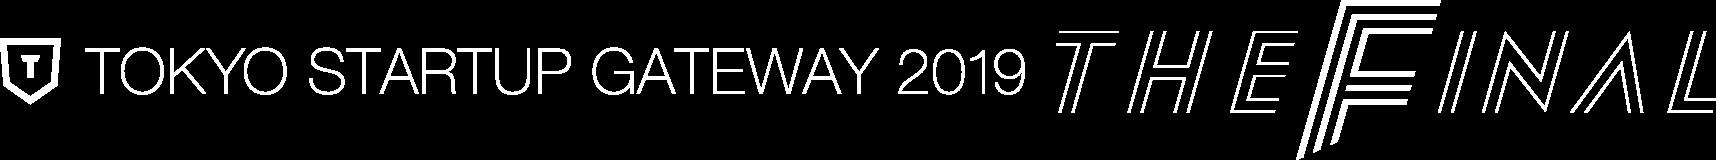 TOKYO STARTUP GATEWAY 2019 THE FINAL